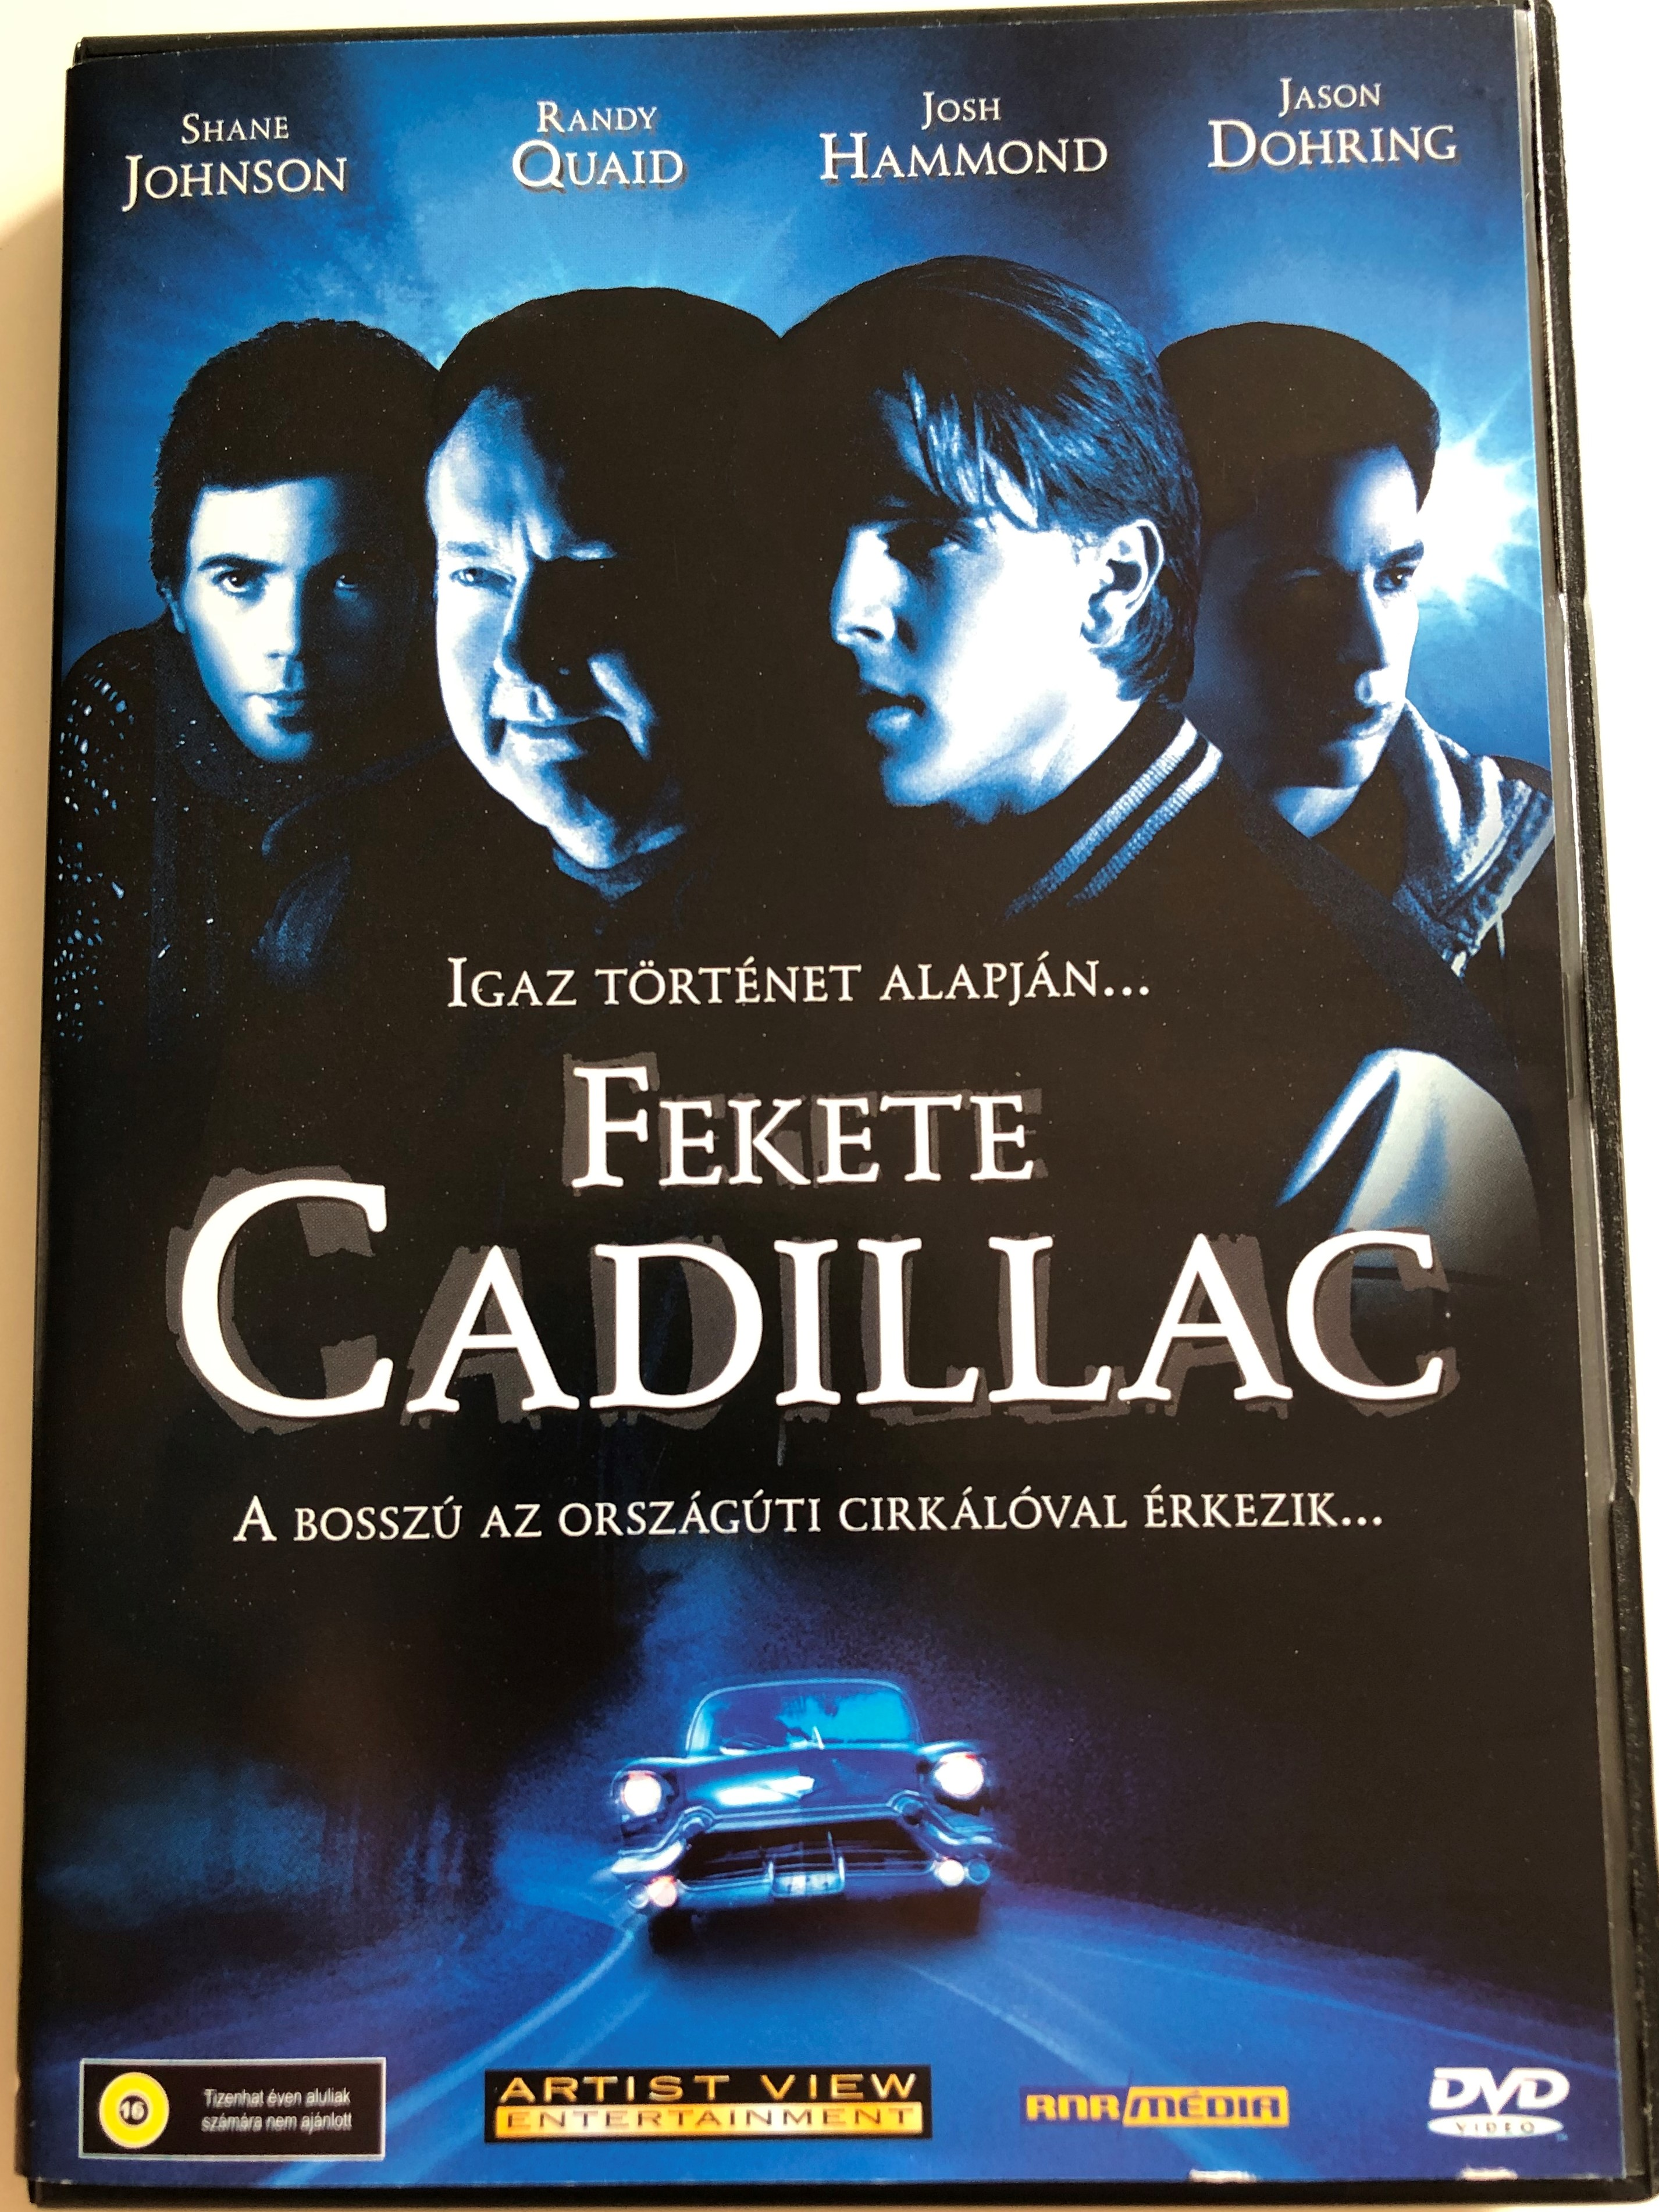 black-cadillac-dvd-2003-fekete-cadillac-igaz-t-rt-net-alapj-n-directed-by-john-murlowski-starring-randy-quaid-shane-johnson-josh-hammond-jason-dohring-1-.jpg